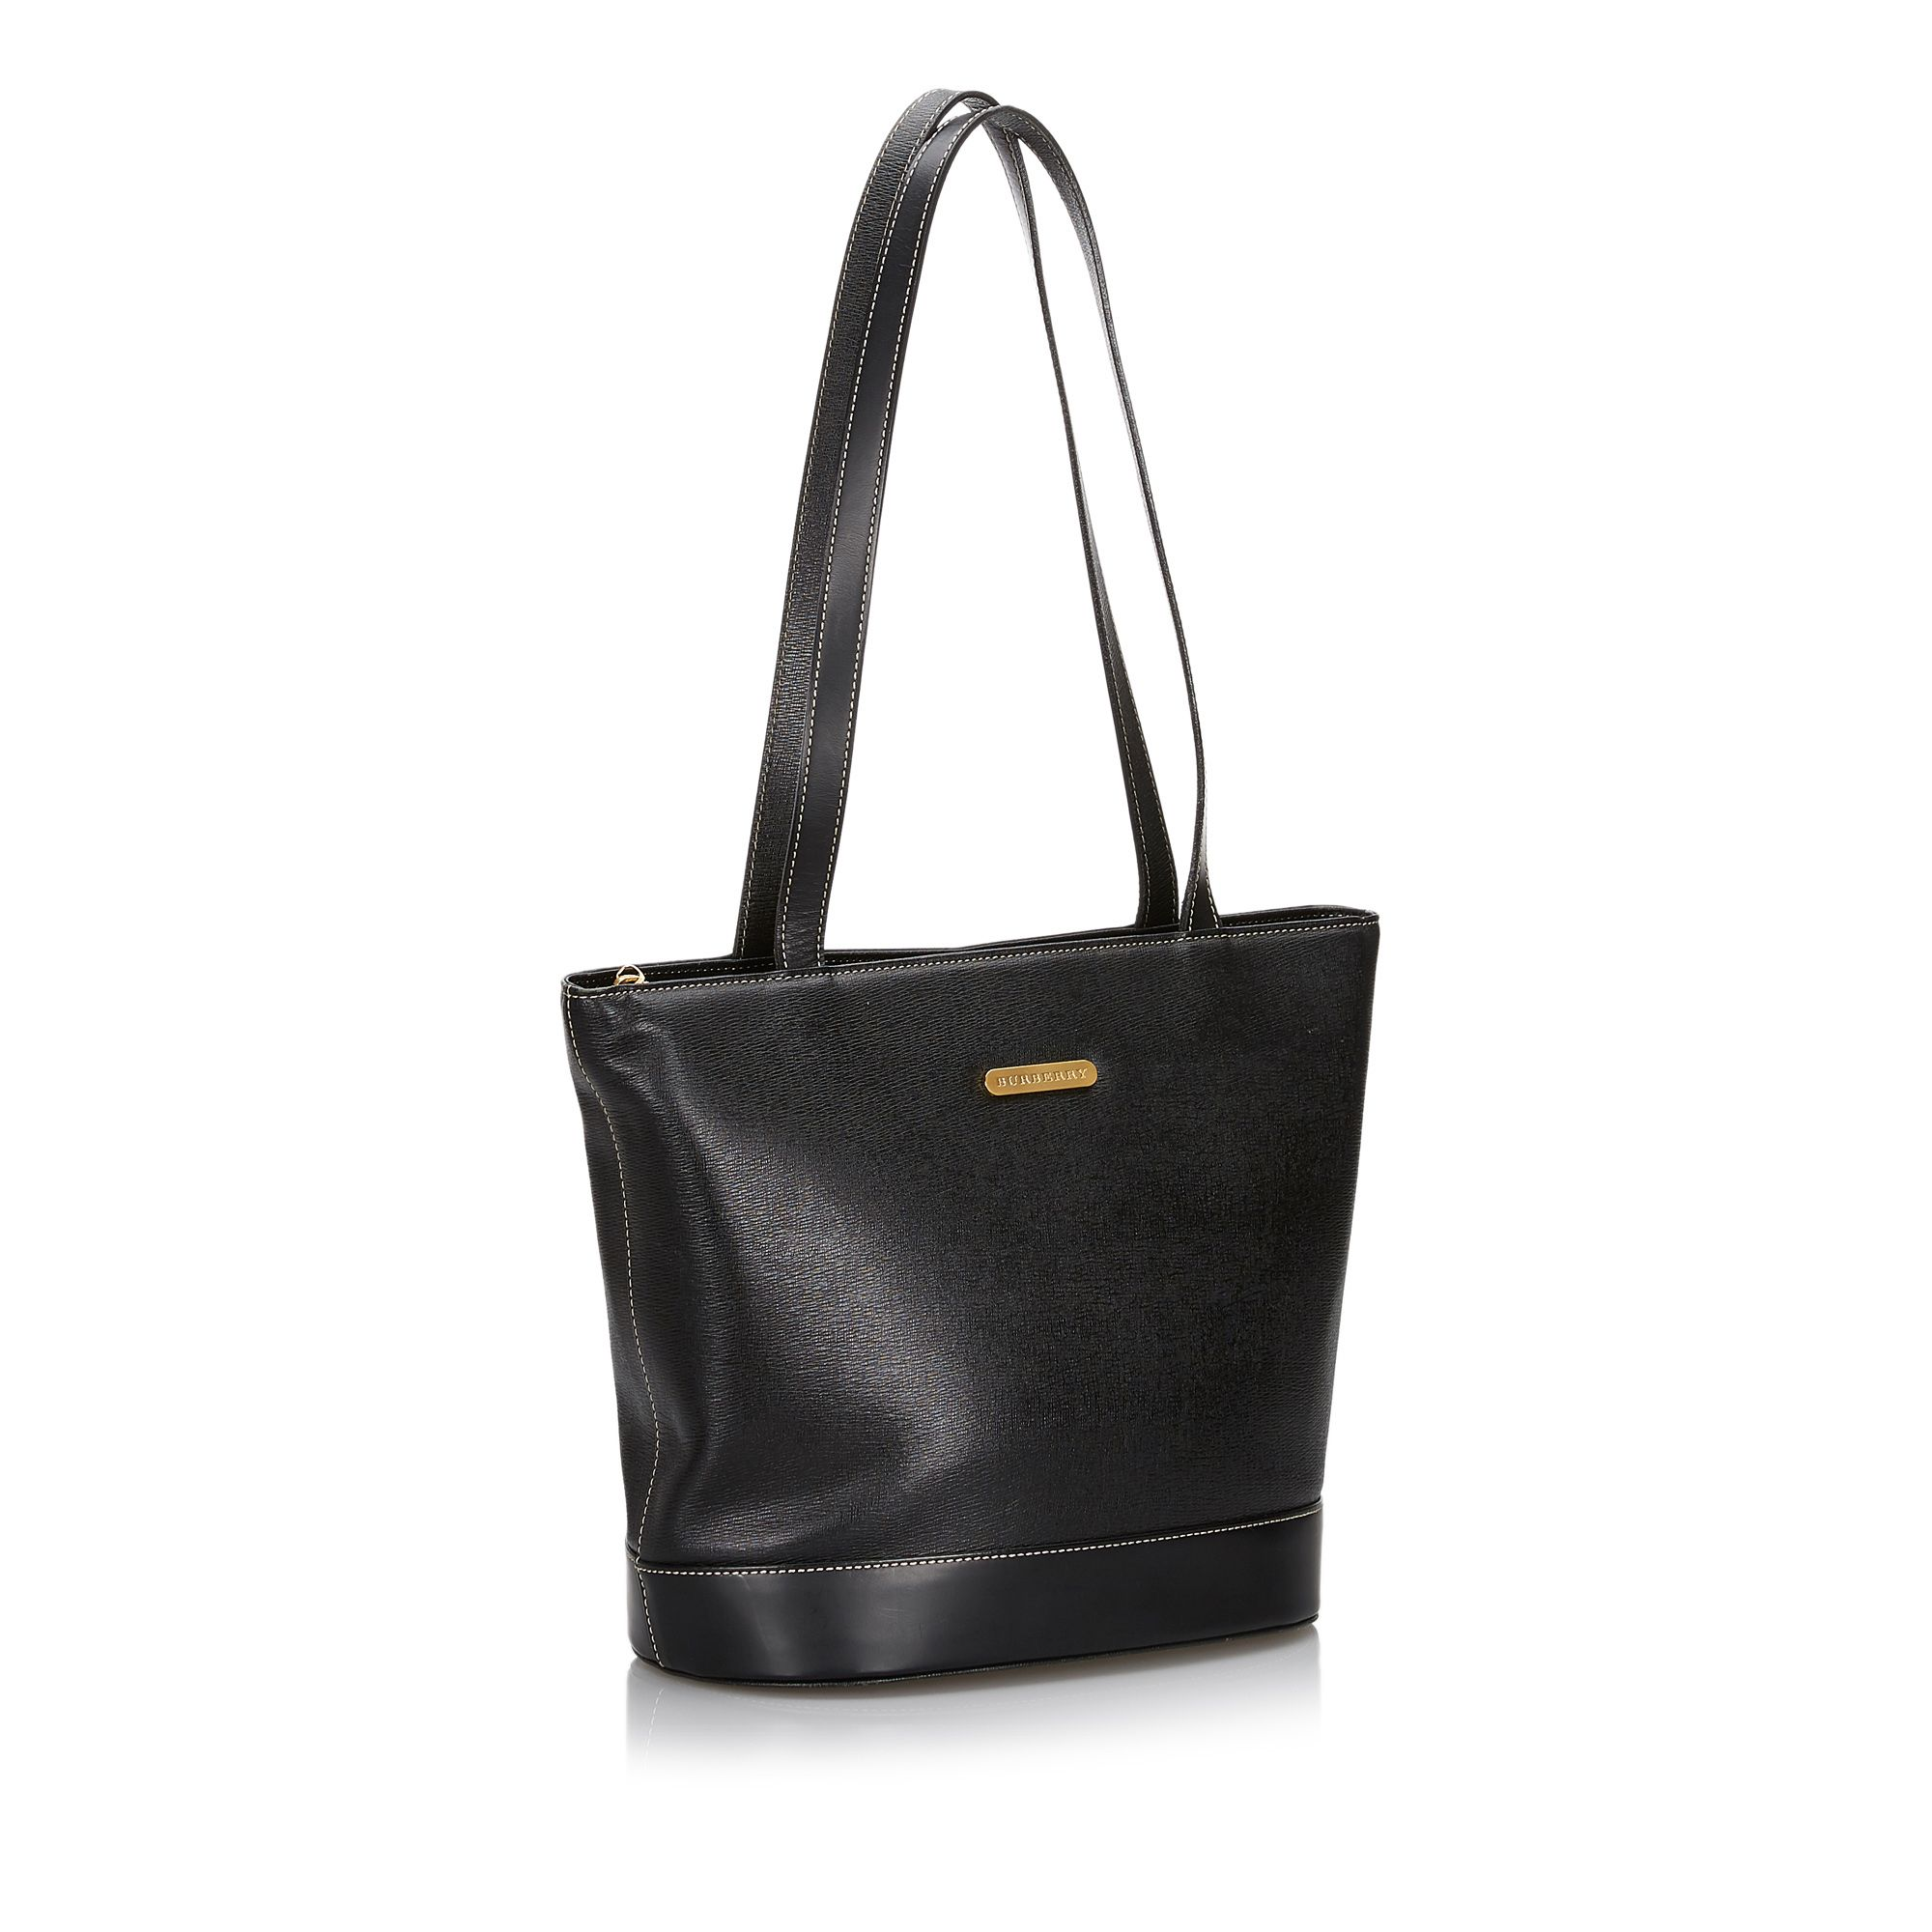 Vintage Burberry Leather Tote Bag Black